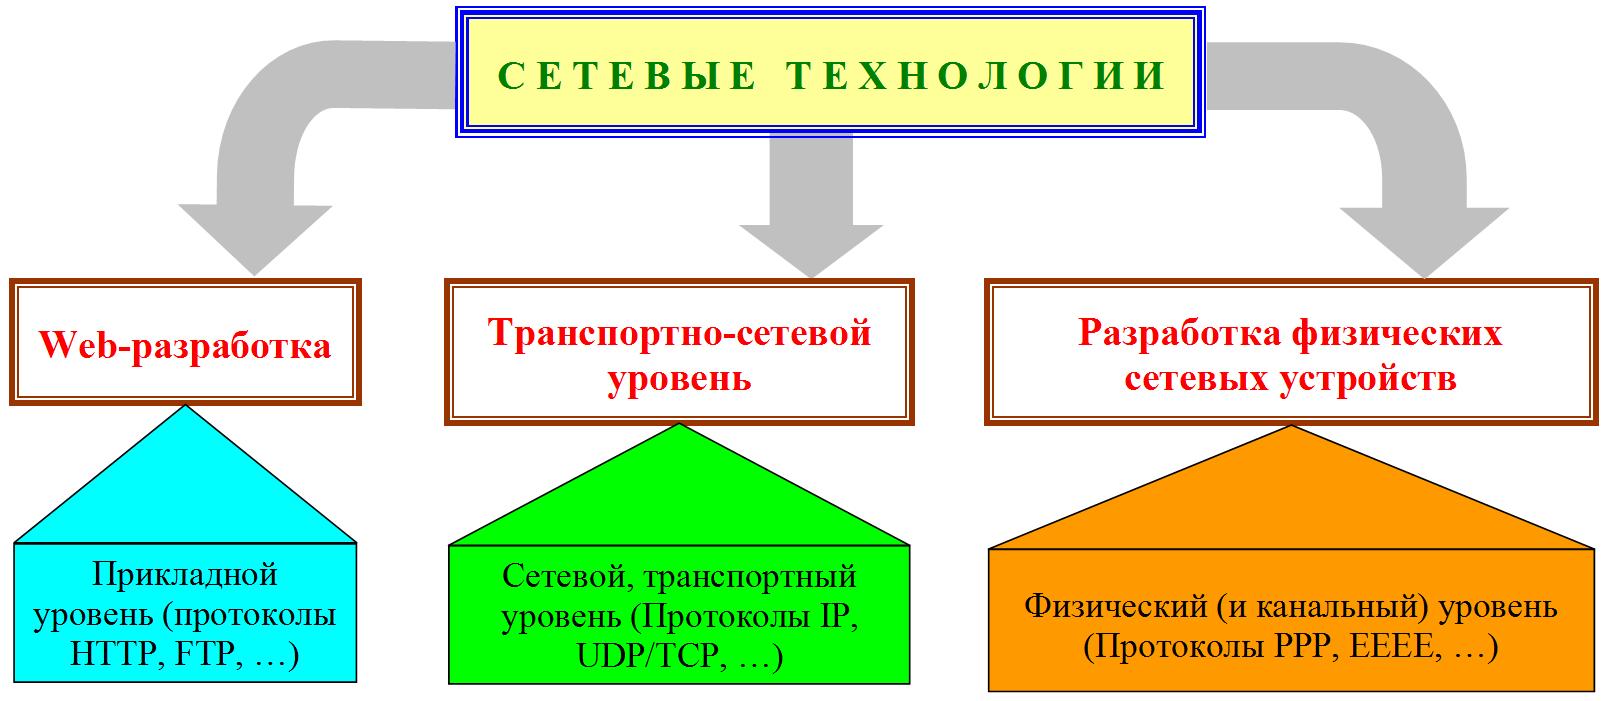 Виды сетевых технологий (области)